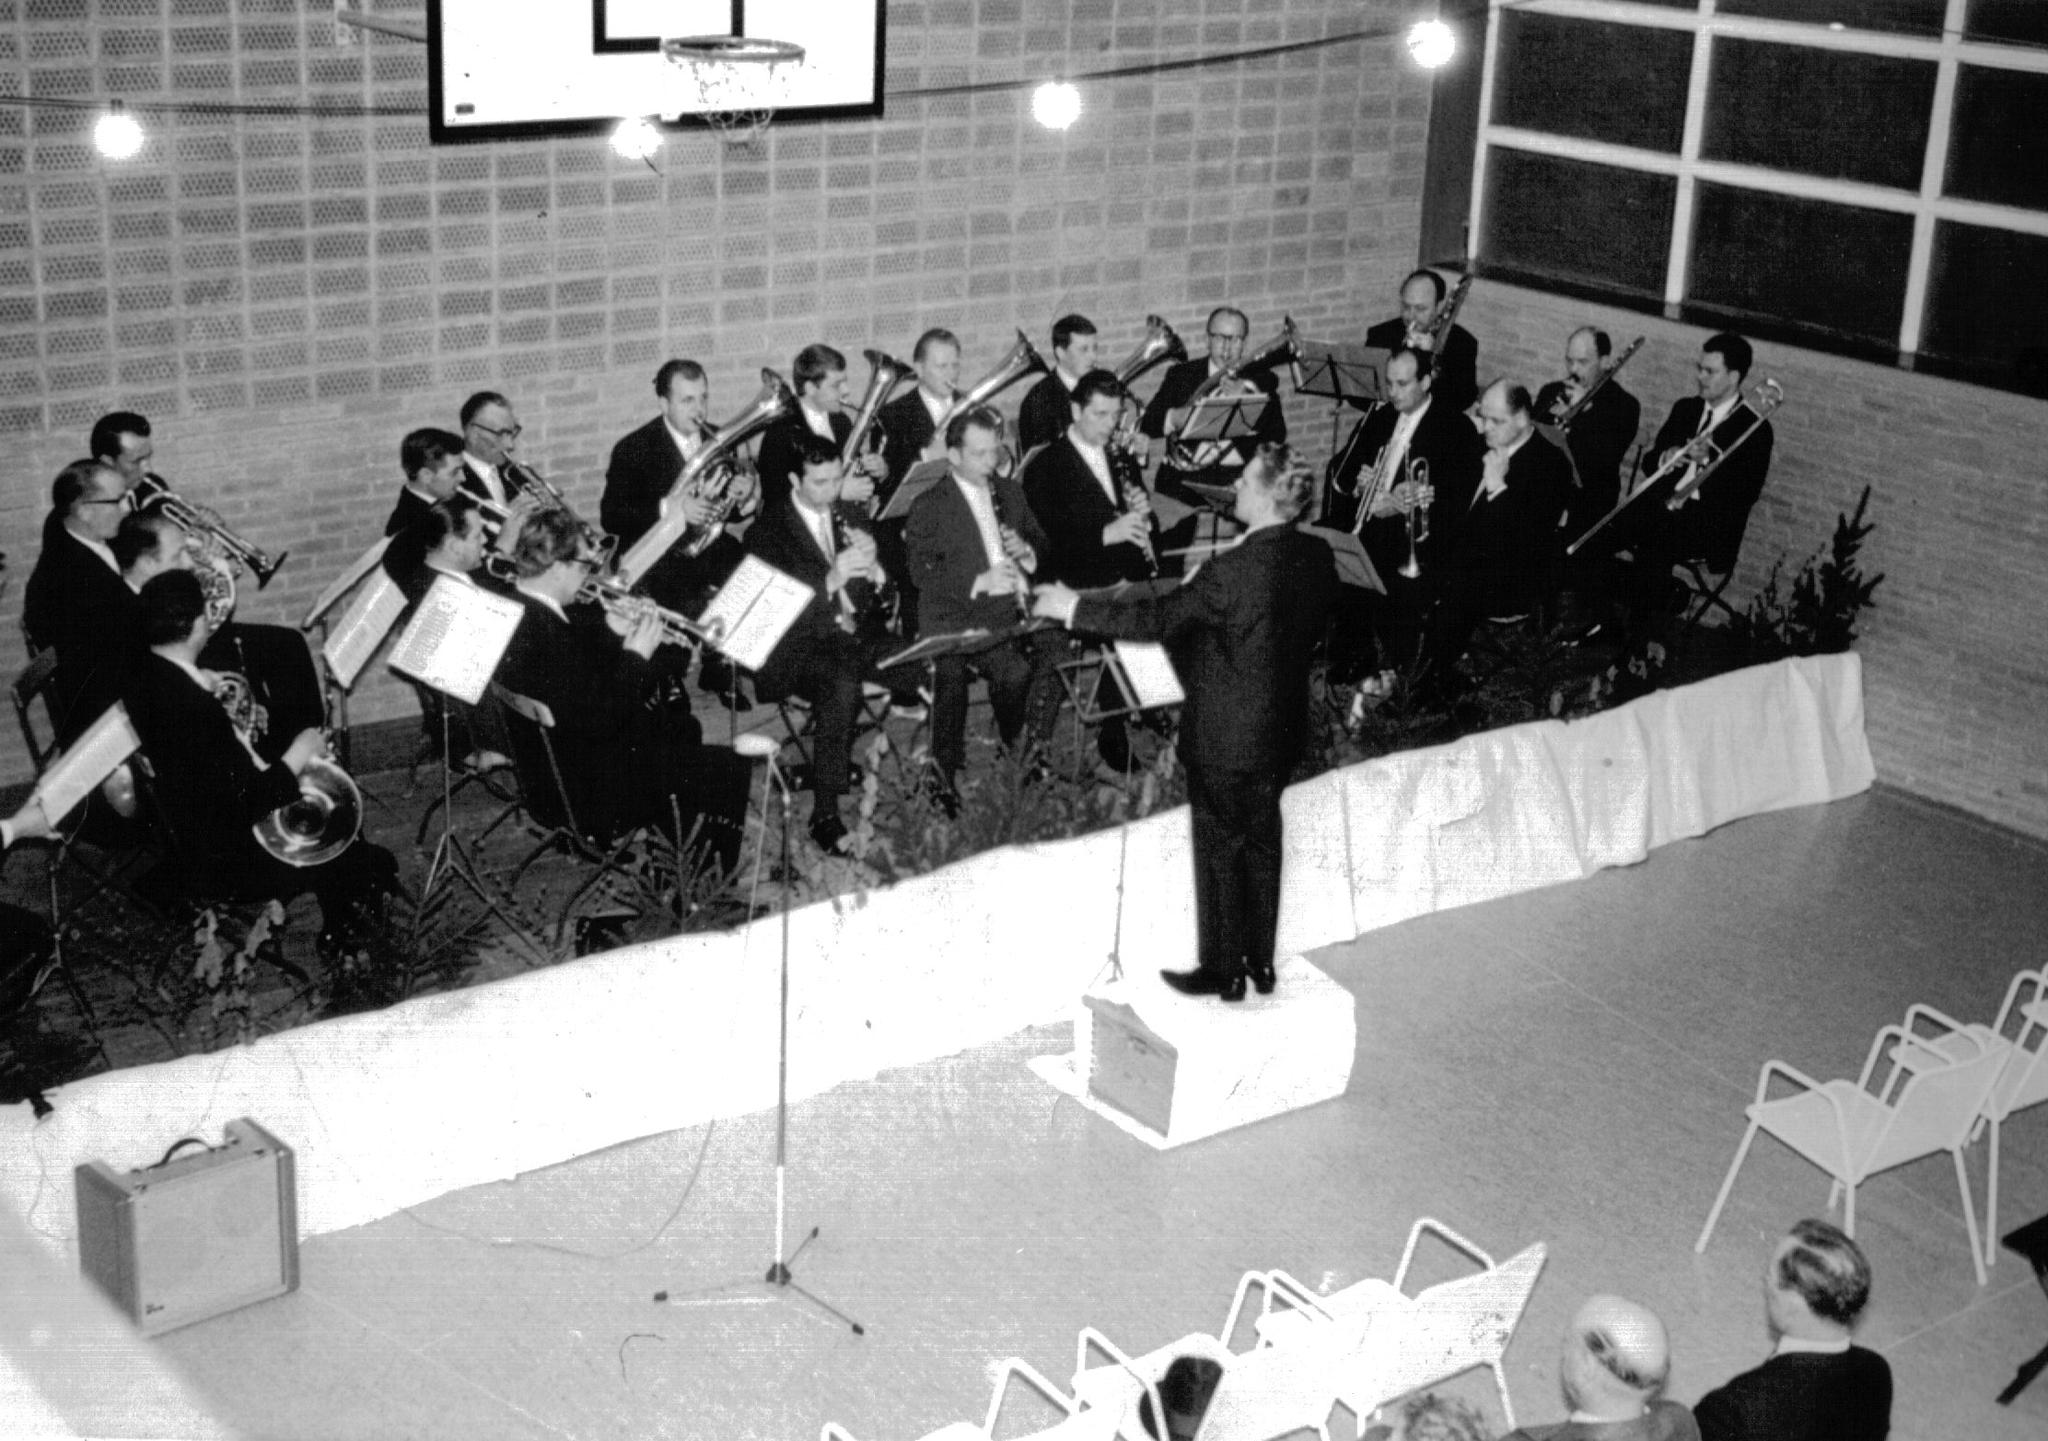 Das erste Konzert (1968)